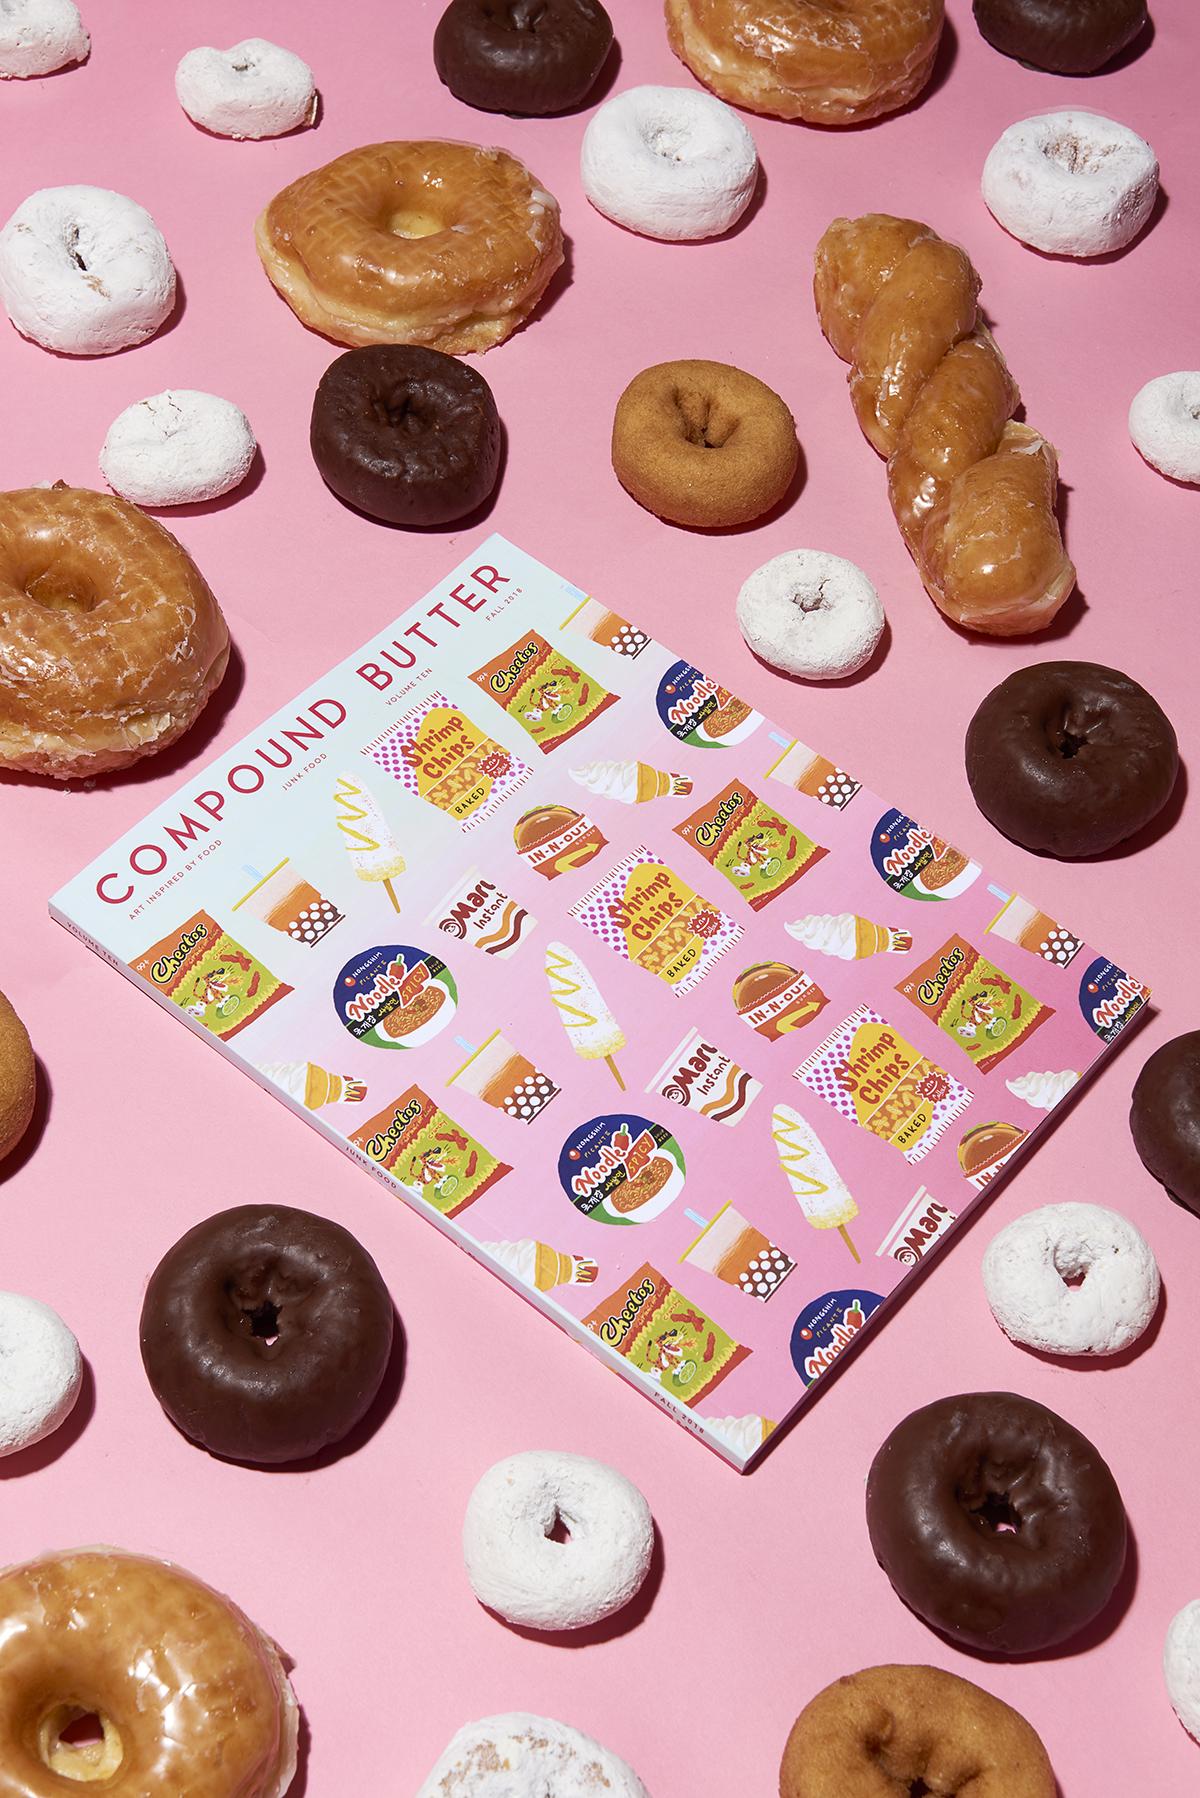 Compund Butter - Junk Food - Donuts 2.jpg